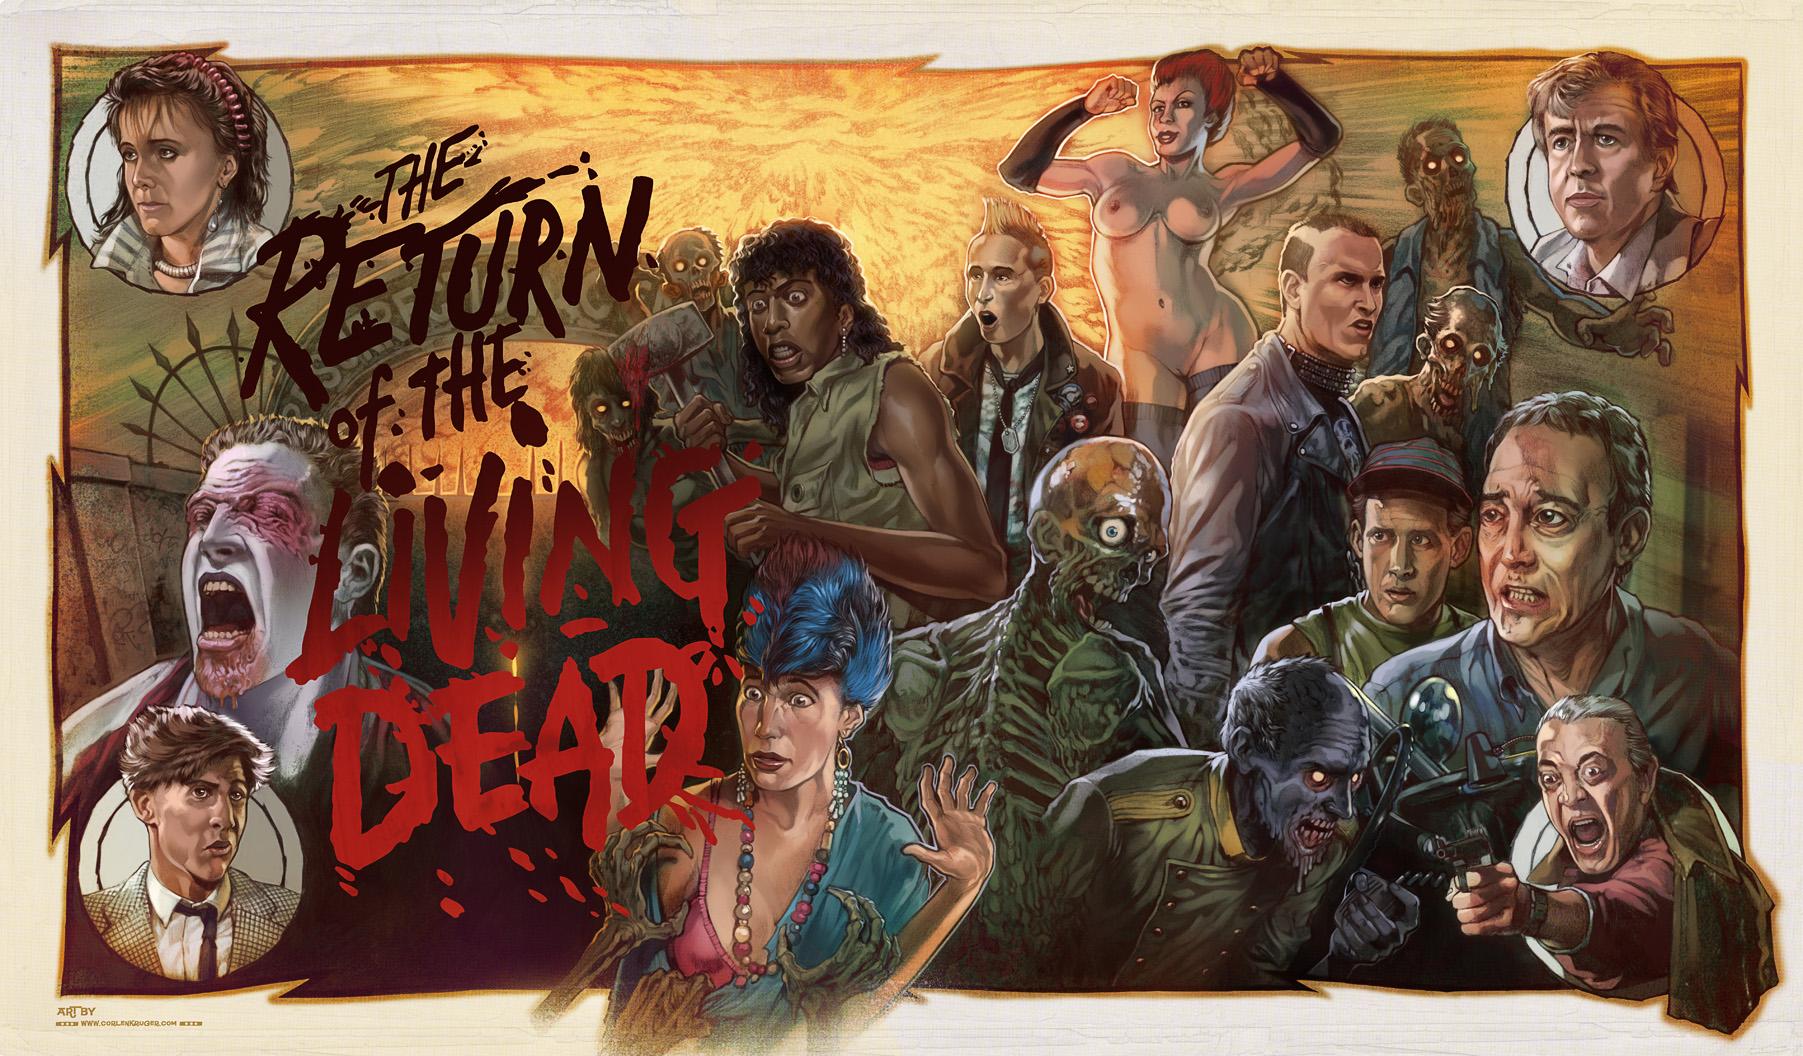 Return-of-the-living-dead-alternative-fan-poster-wallpaper-wp50011645